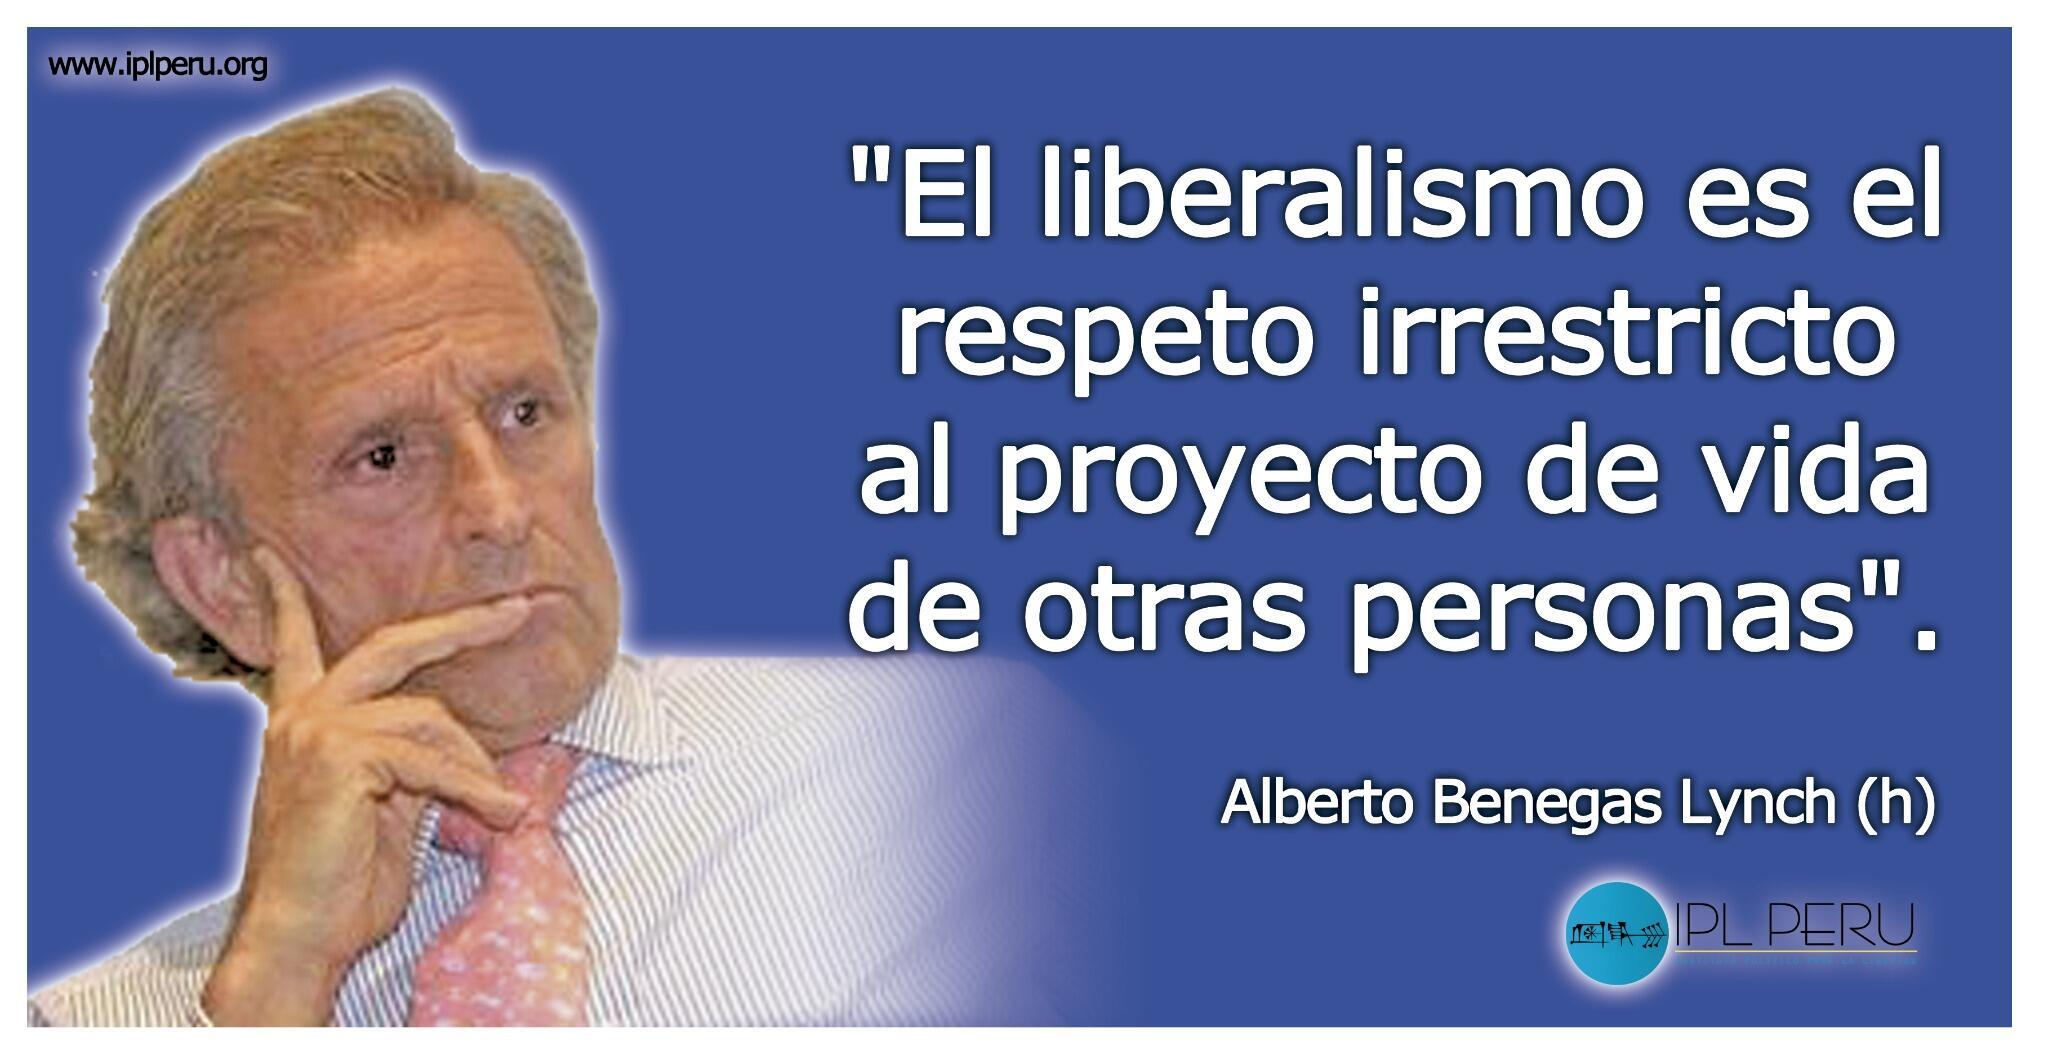 "IPL Libertad sur Twitter : ""Frases del economista y escritor argentino.  Alberto Benegas Lynch @iplperu @CEDICE @cam_lib http://t.co/NNSmqTOmiG"""